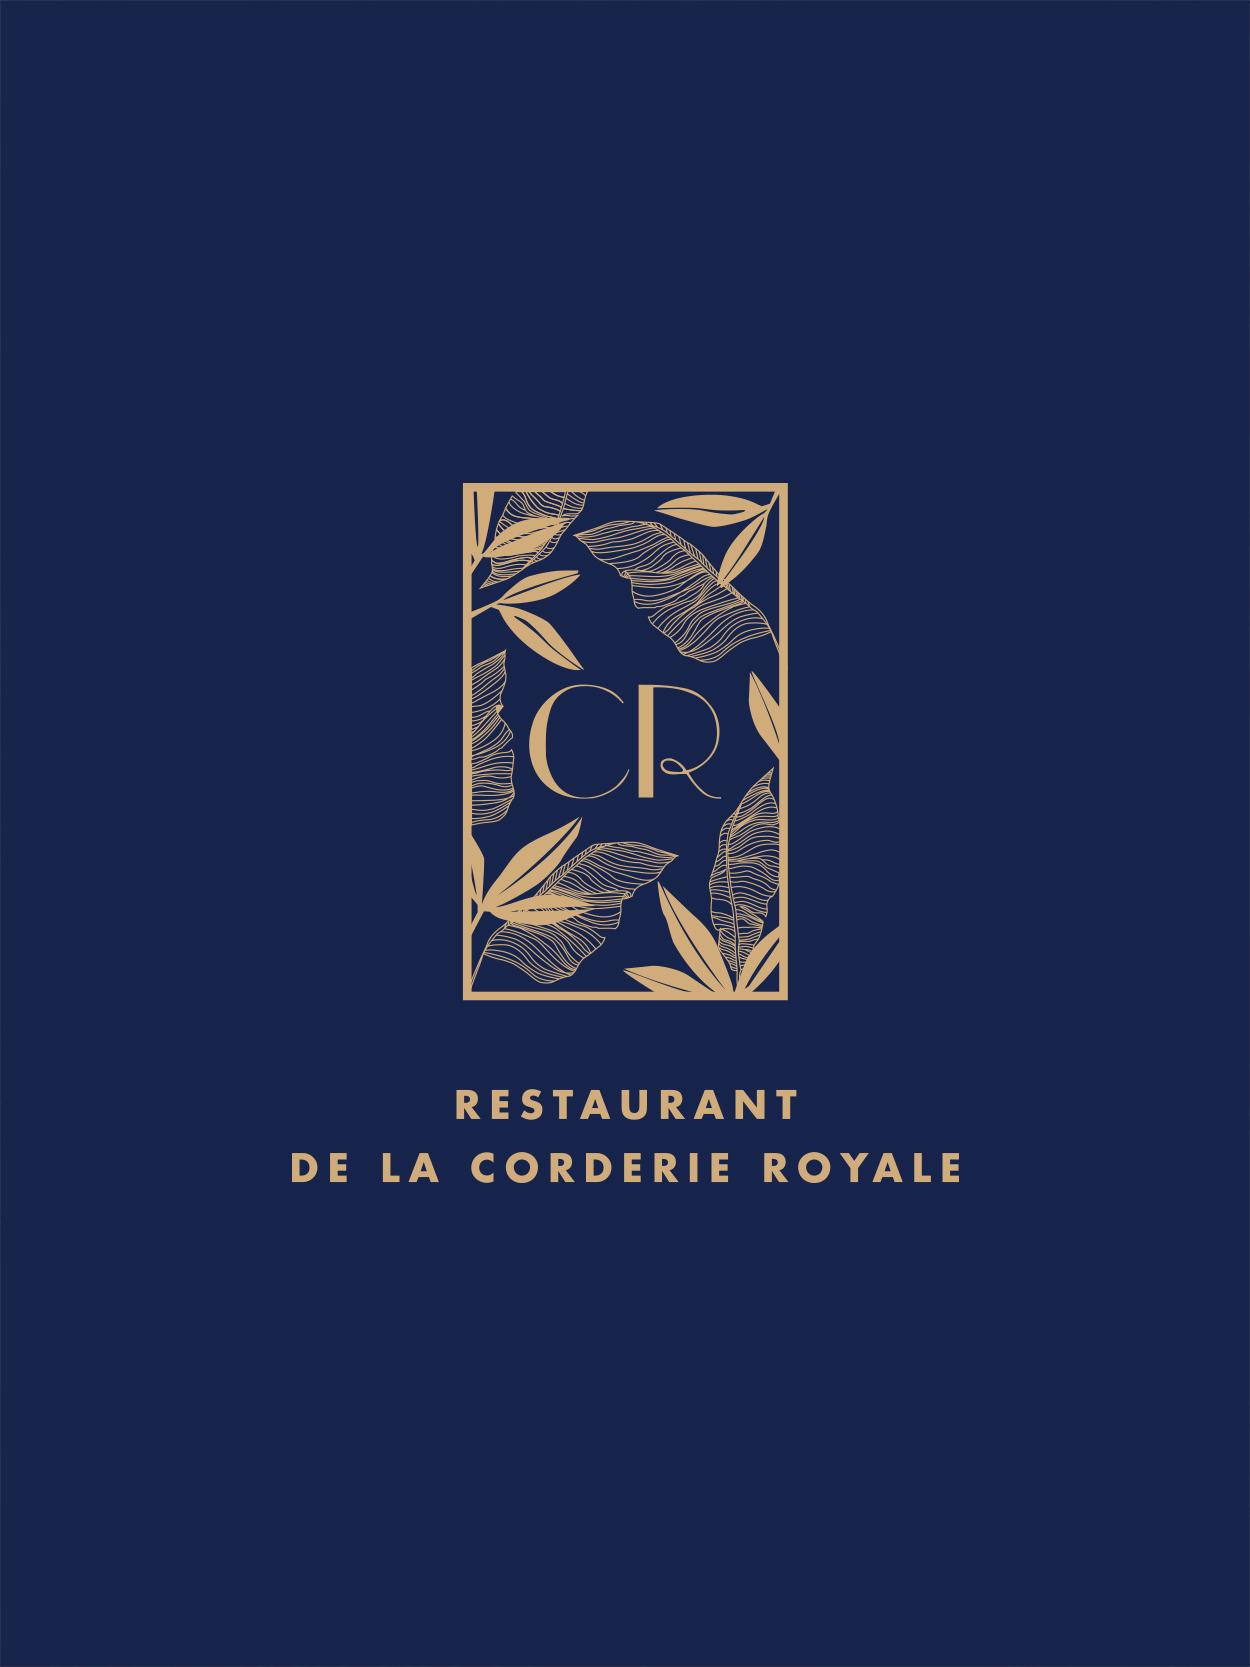 corderie royale logo